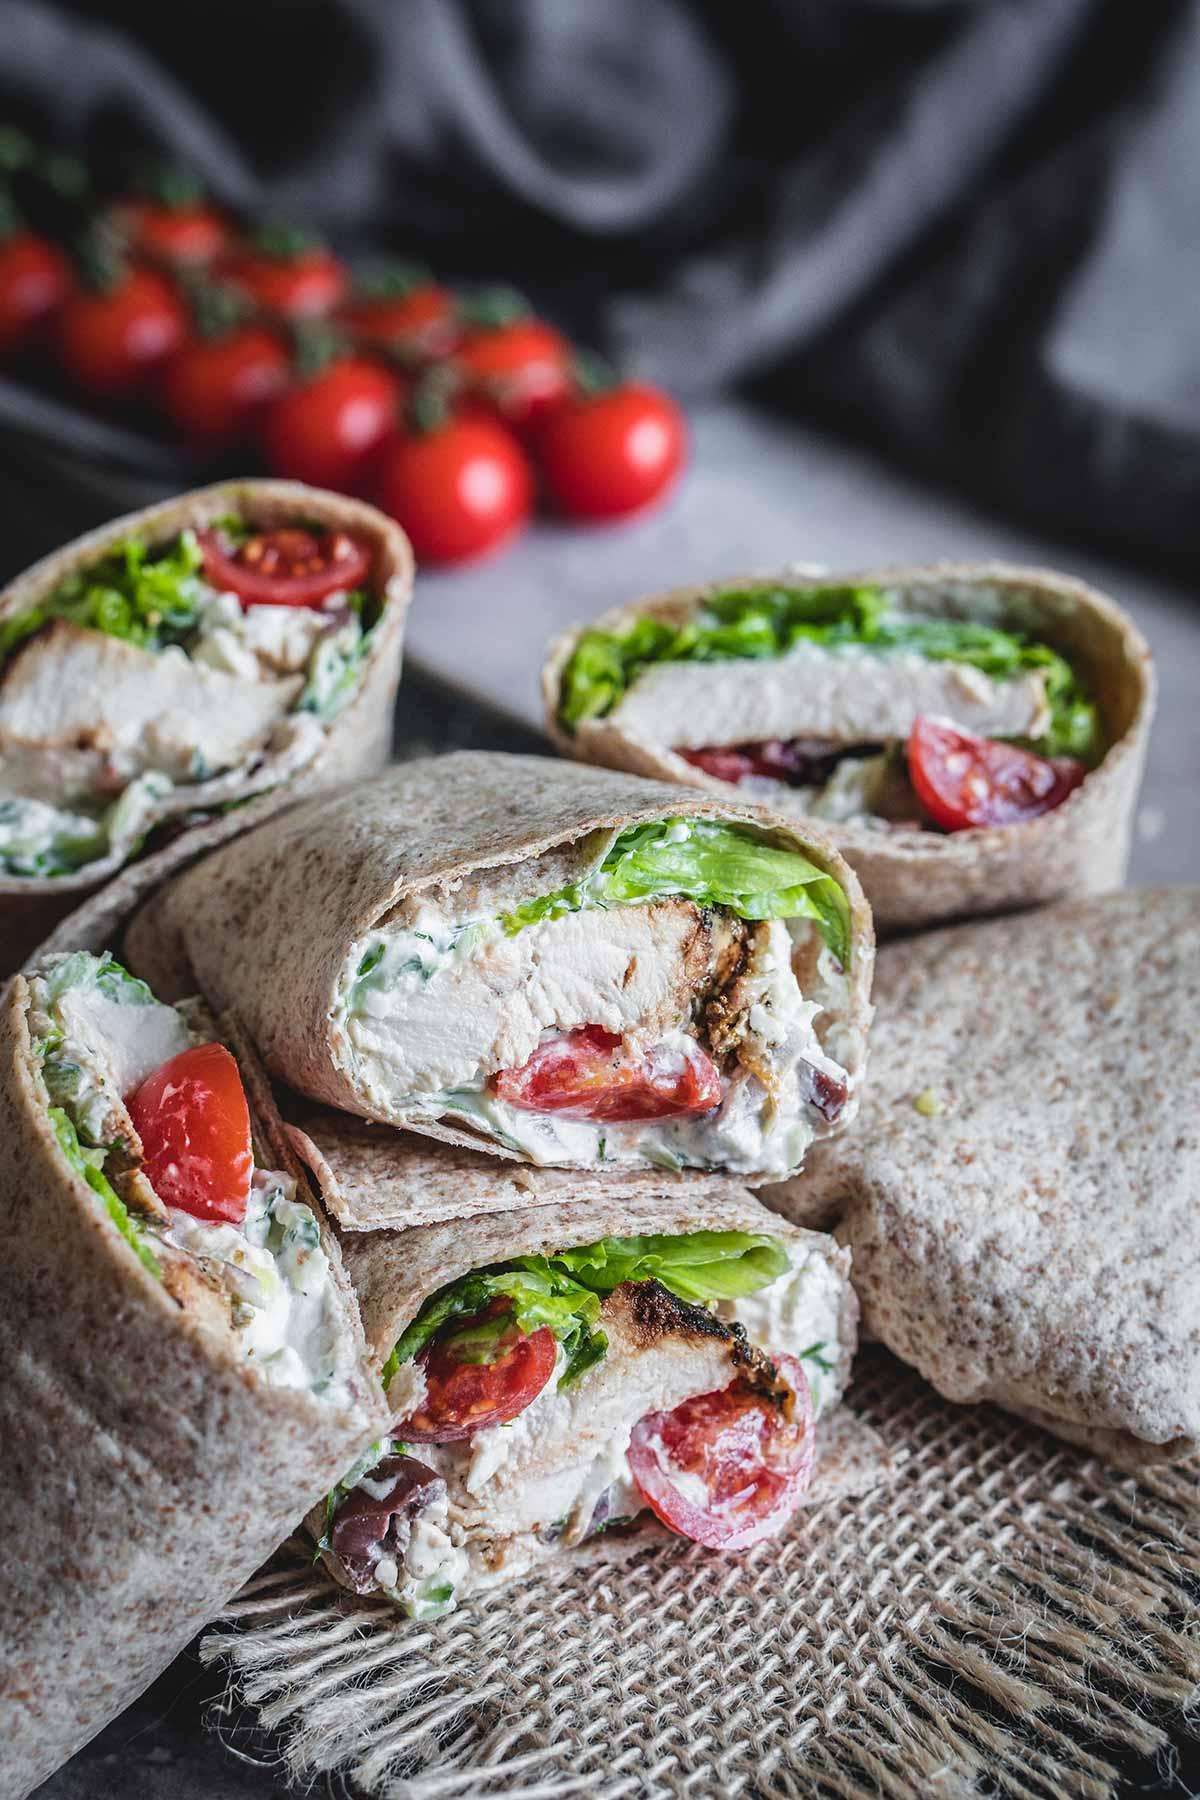 Greek inspired healthy chicken wraps with homemade tzatziki sauce